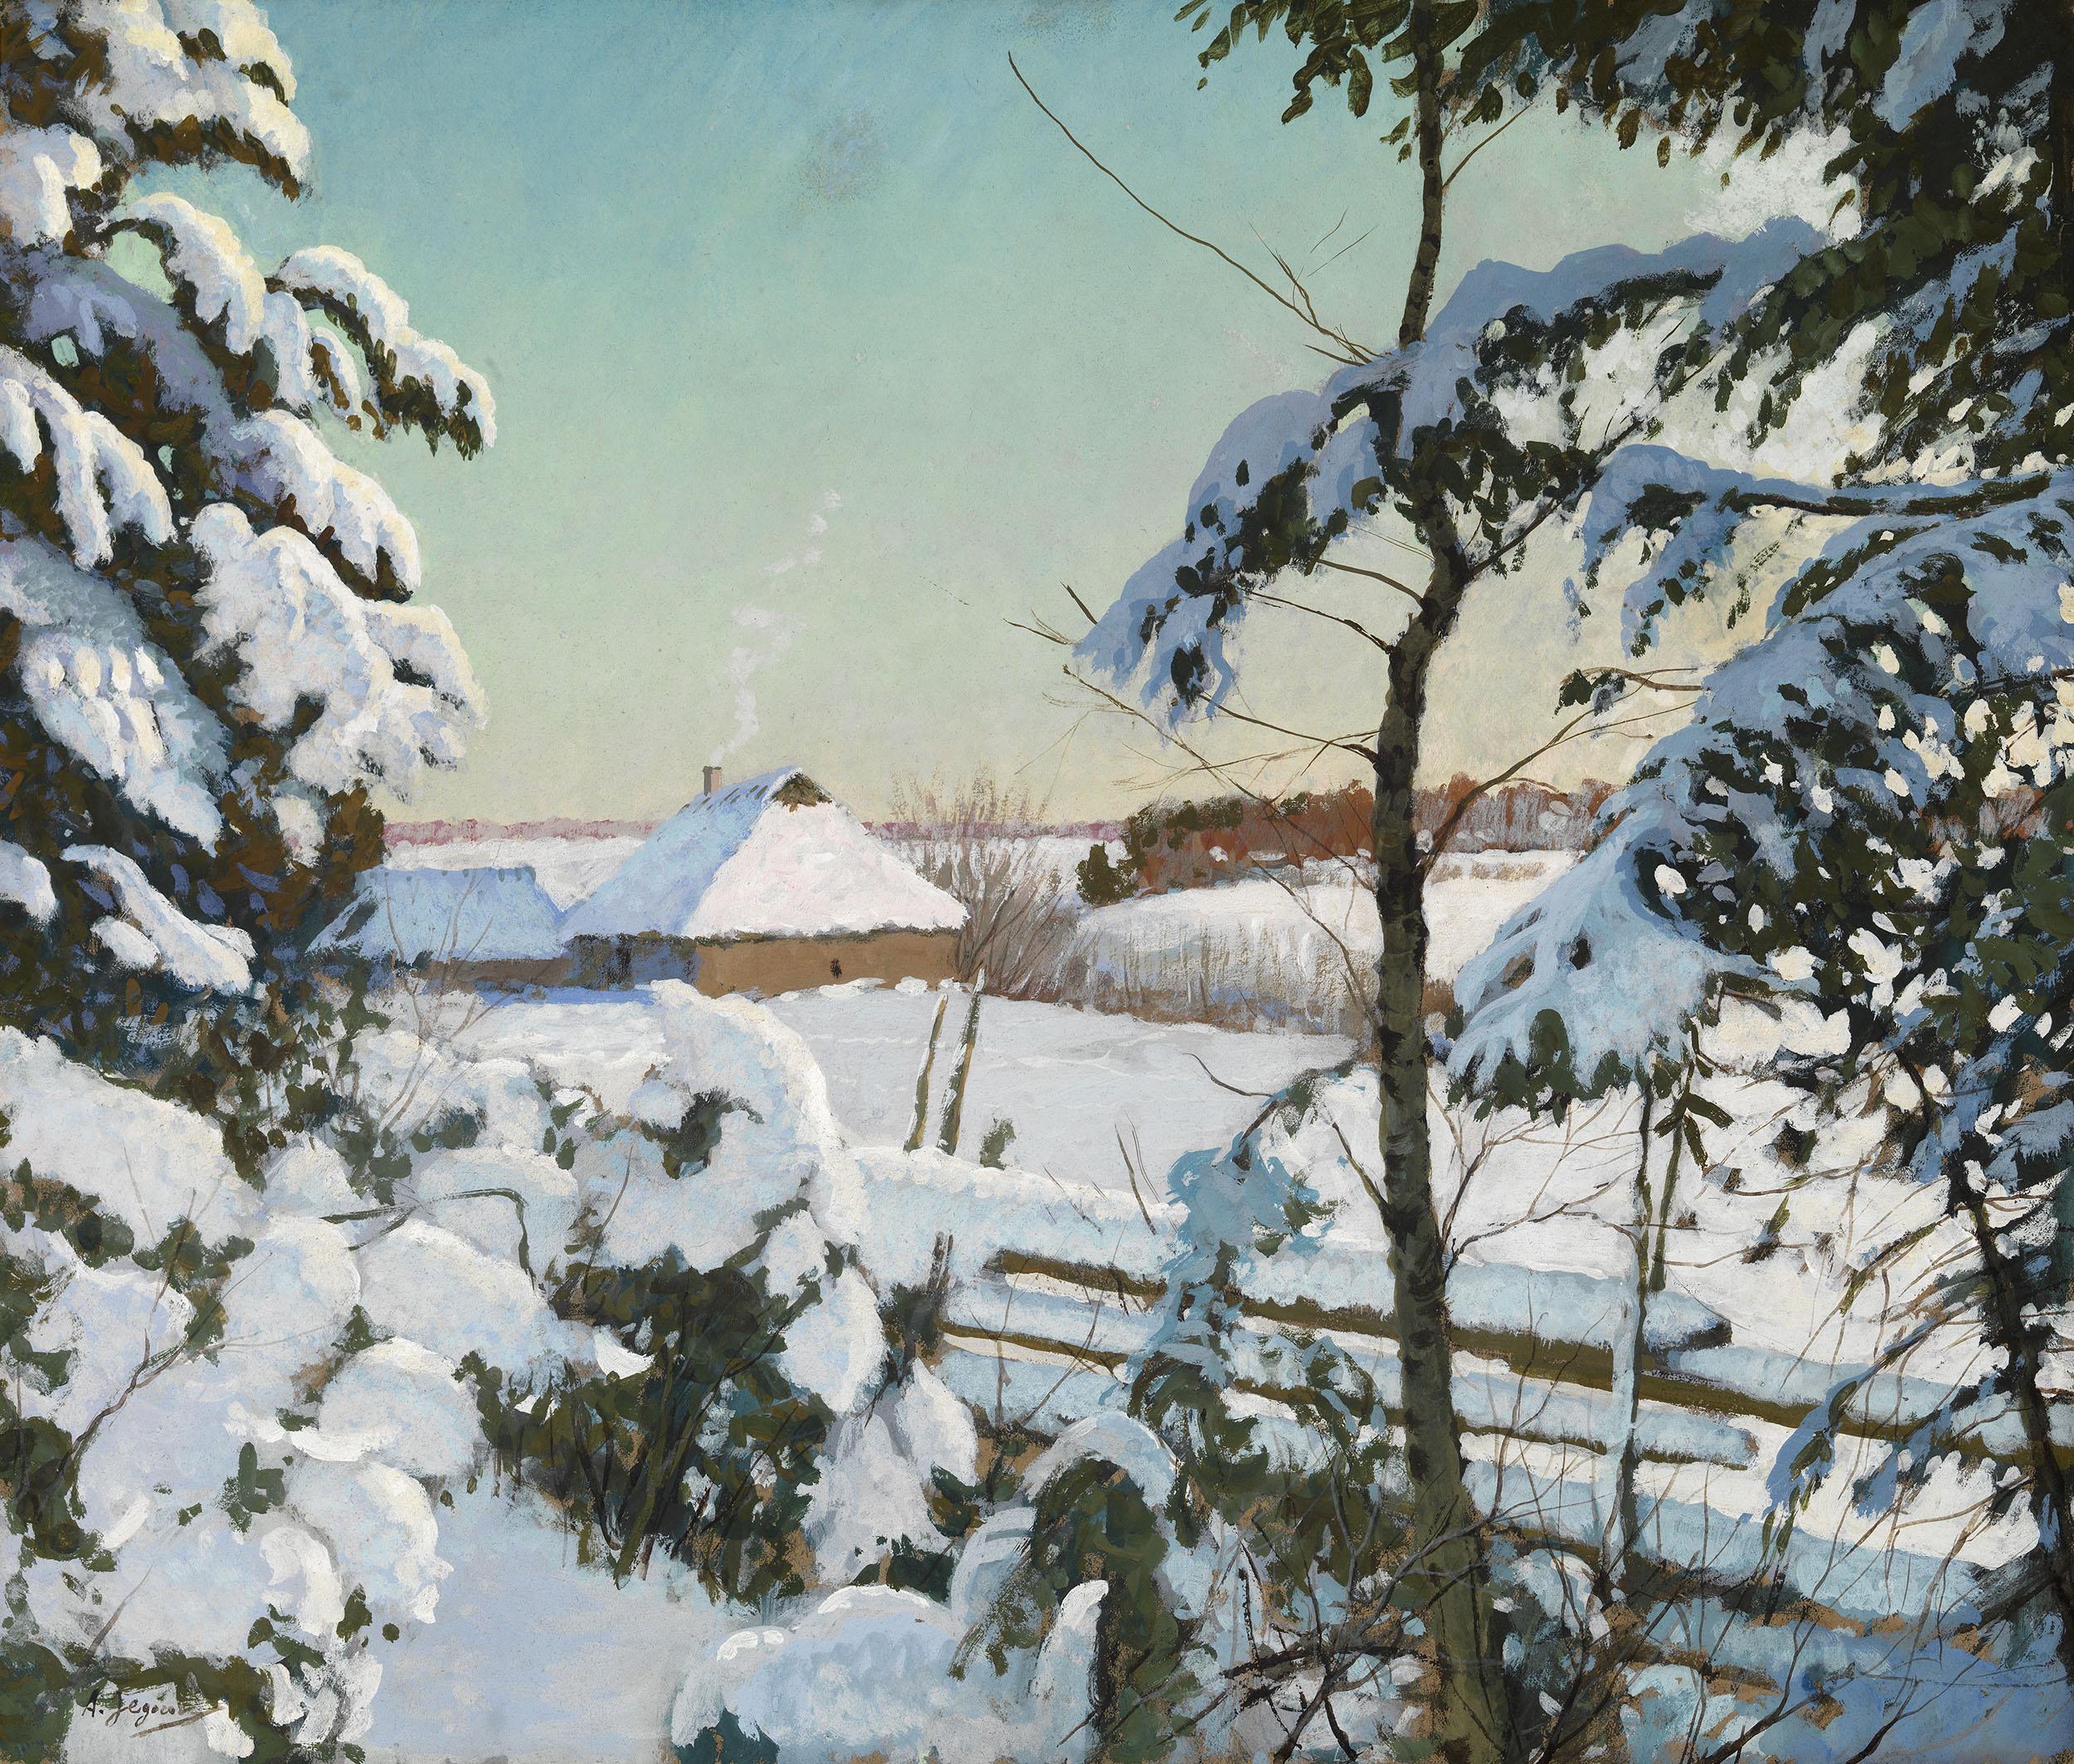 EGOROV, ANDREI Winter Landscape 2